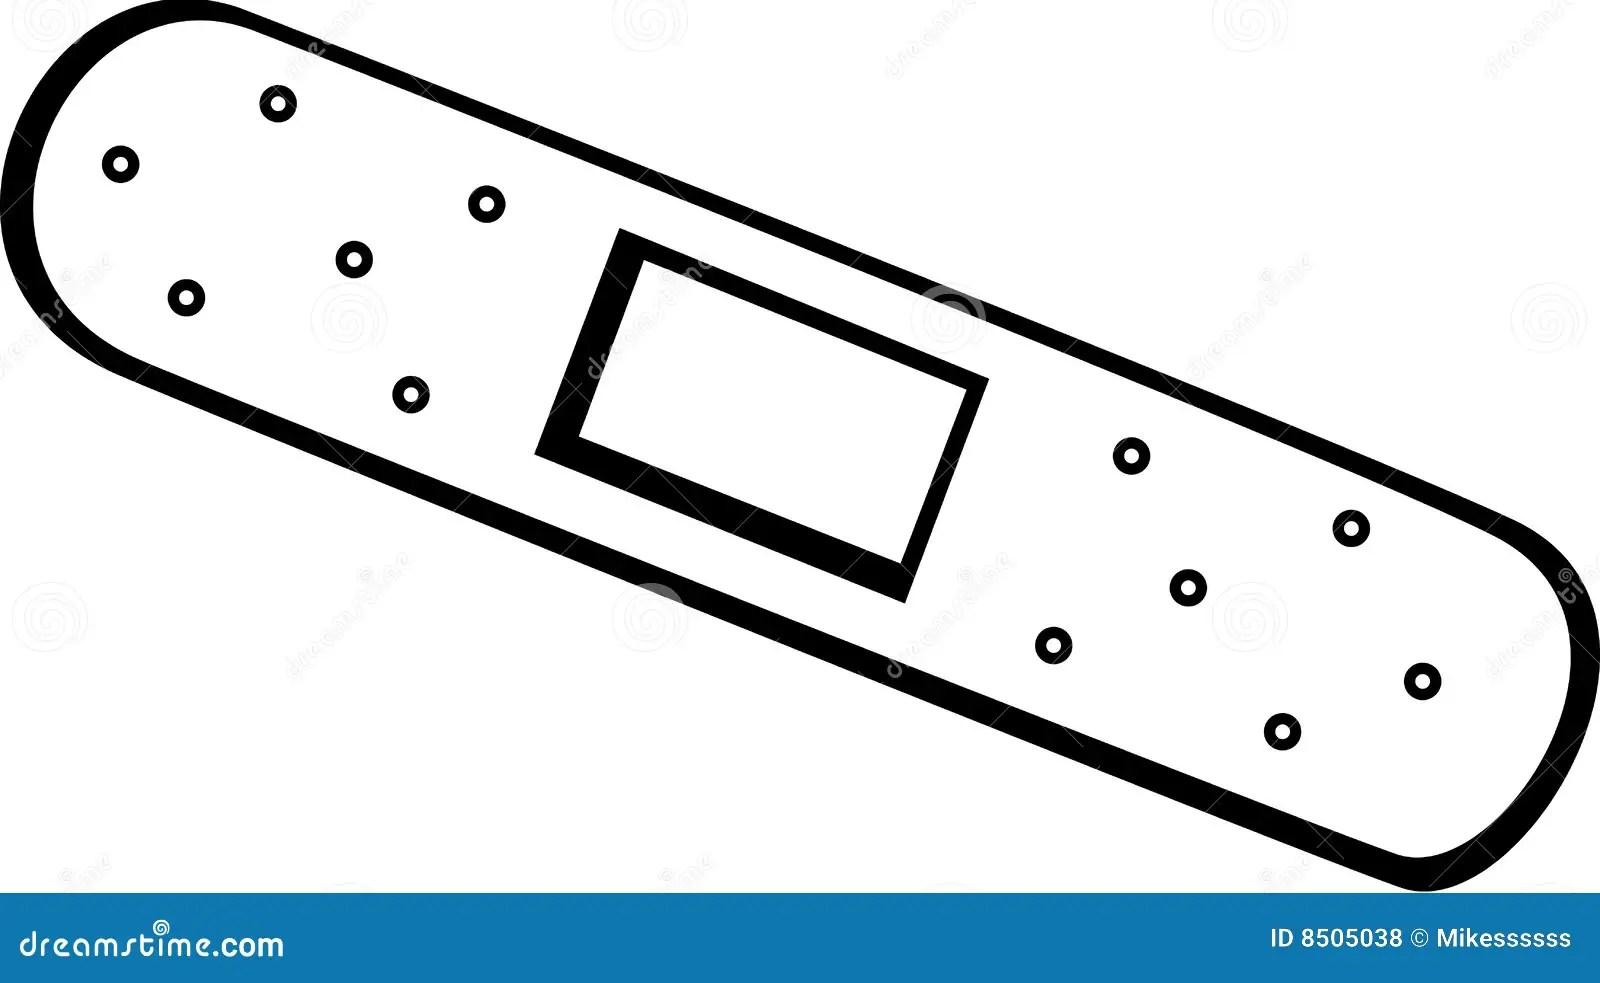 Adhesive Bandage Vector Illustration Royalty Free Stock